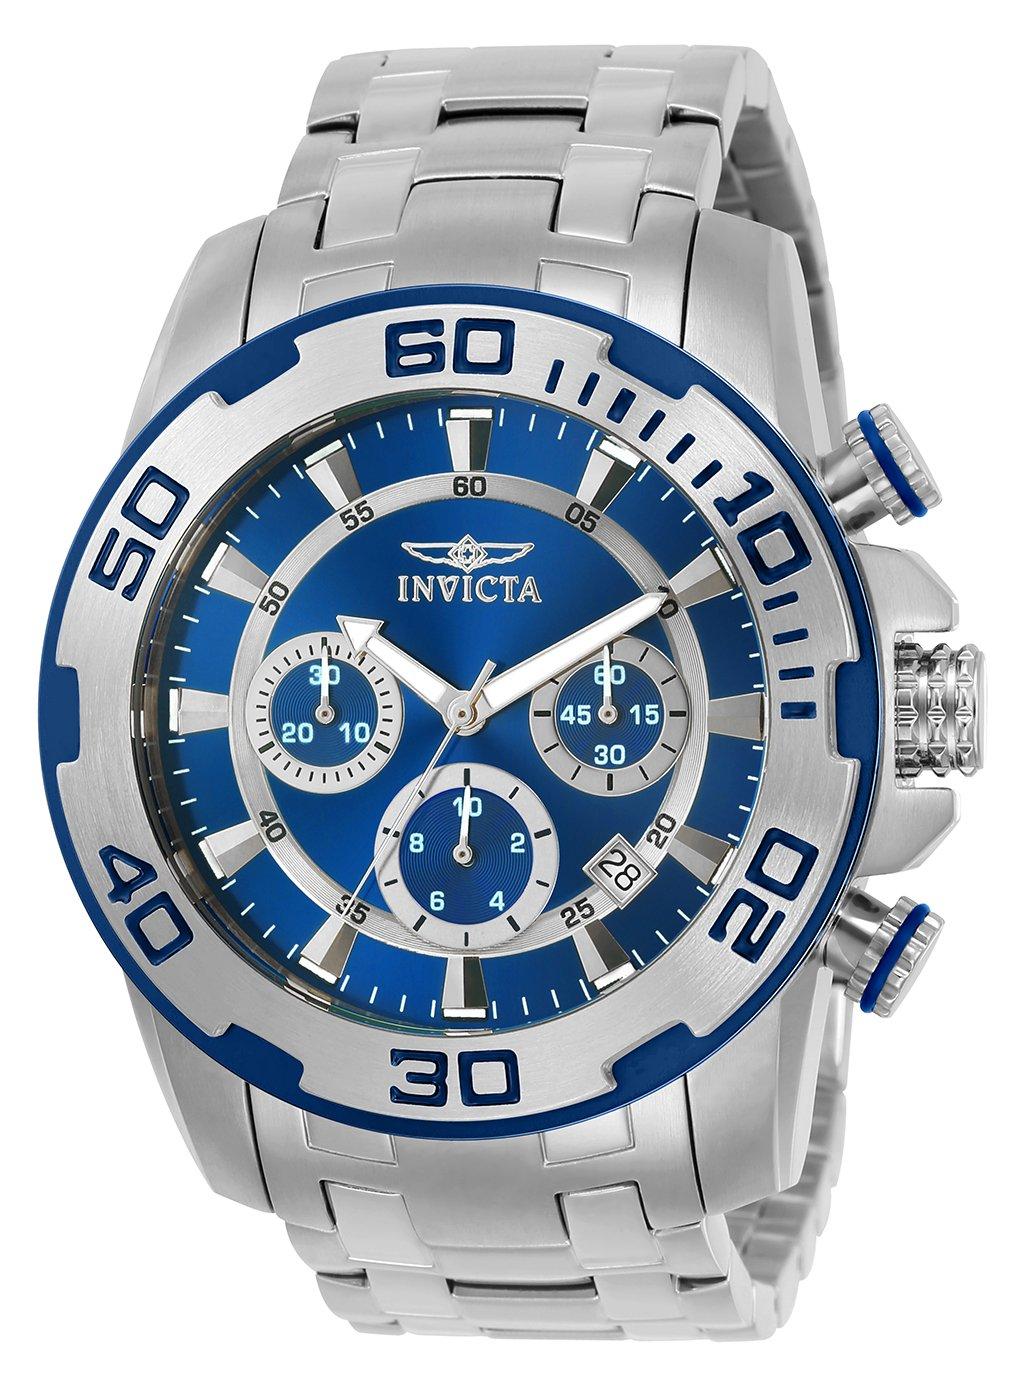 Invicta 22319 Pro Diver – Scuba Reloj para Hombre acero inoxidable Cuarzo Esfera azul